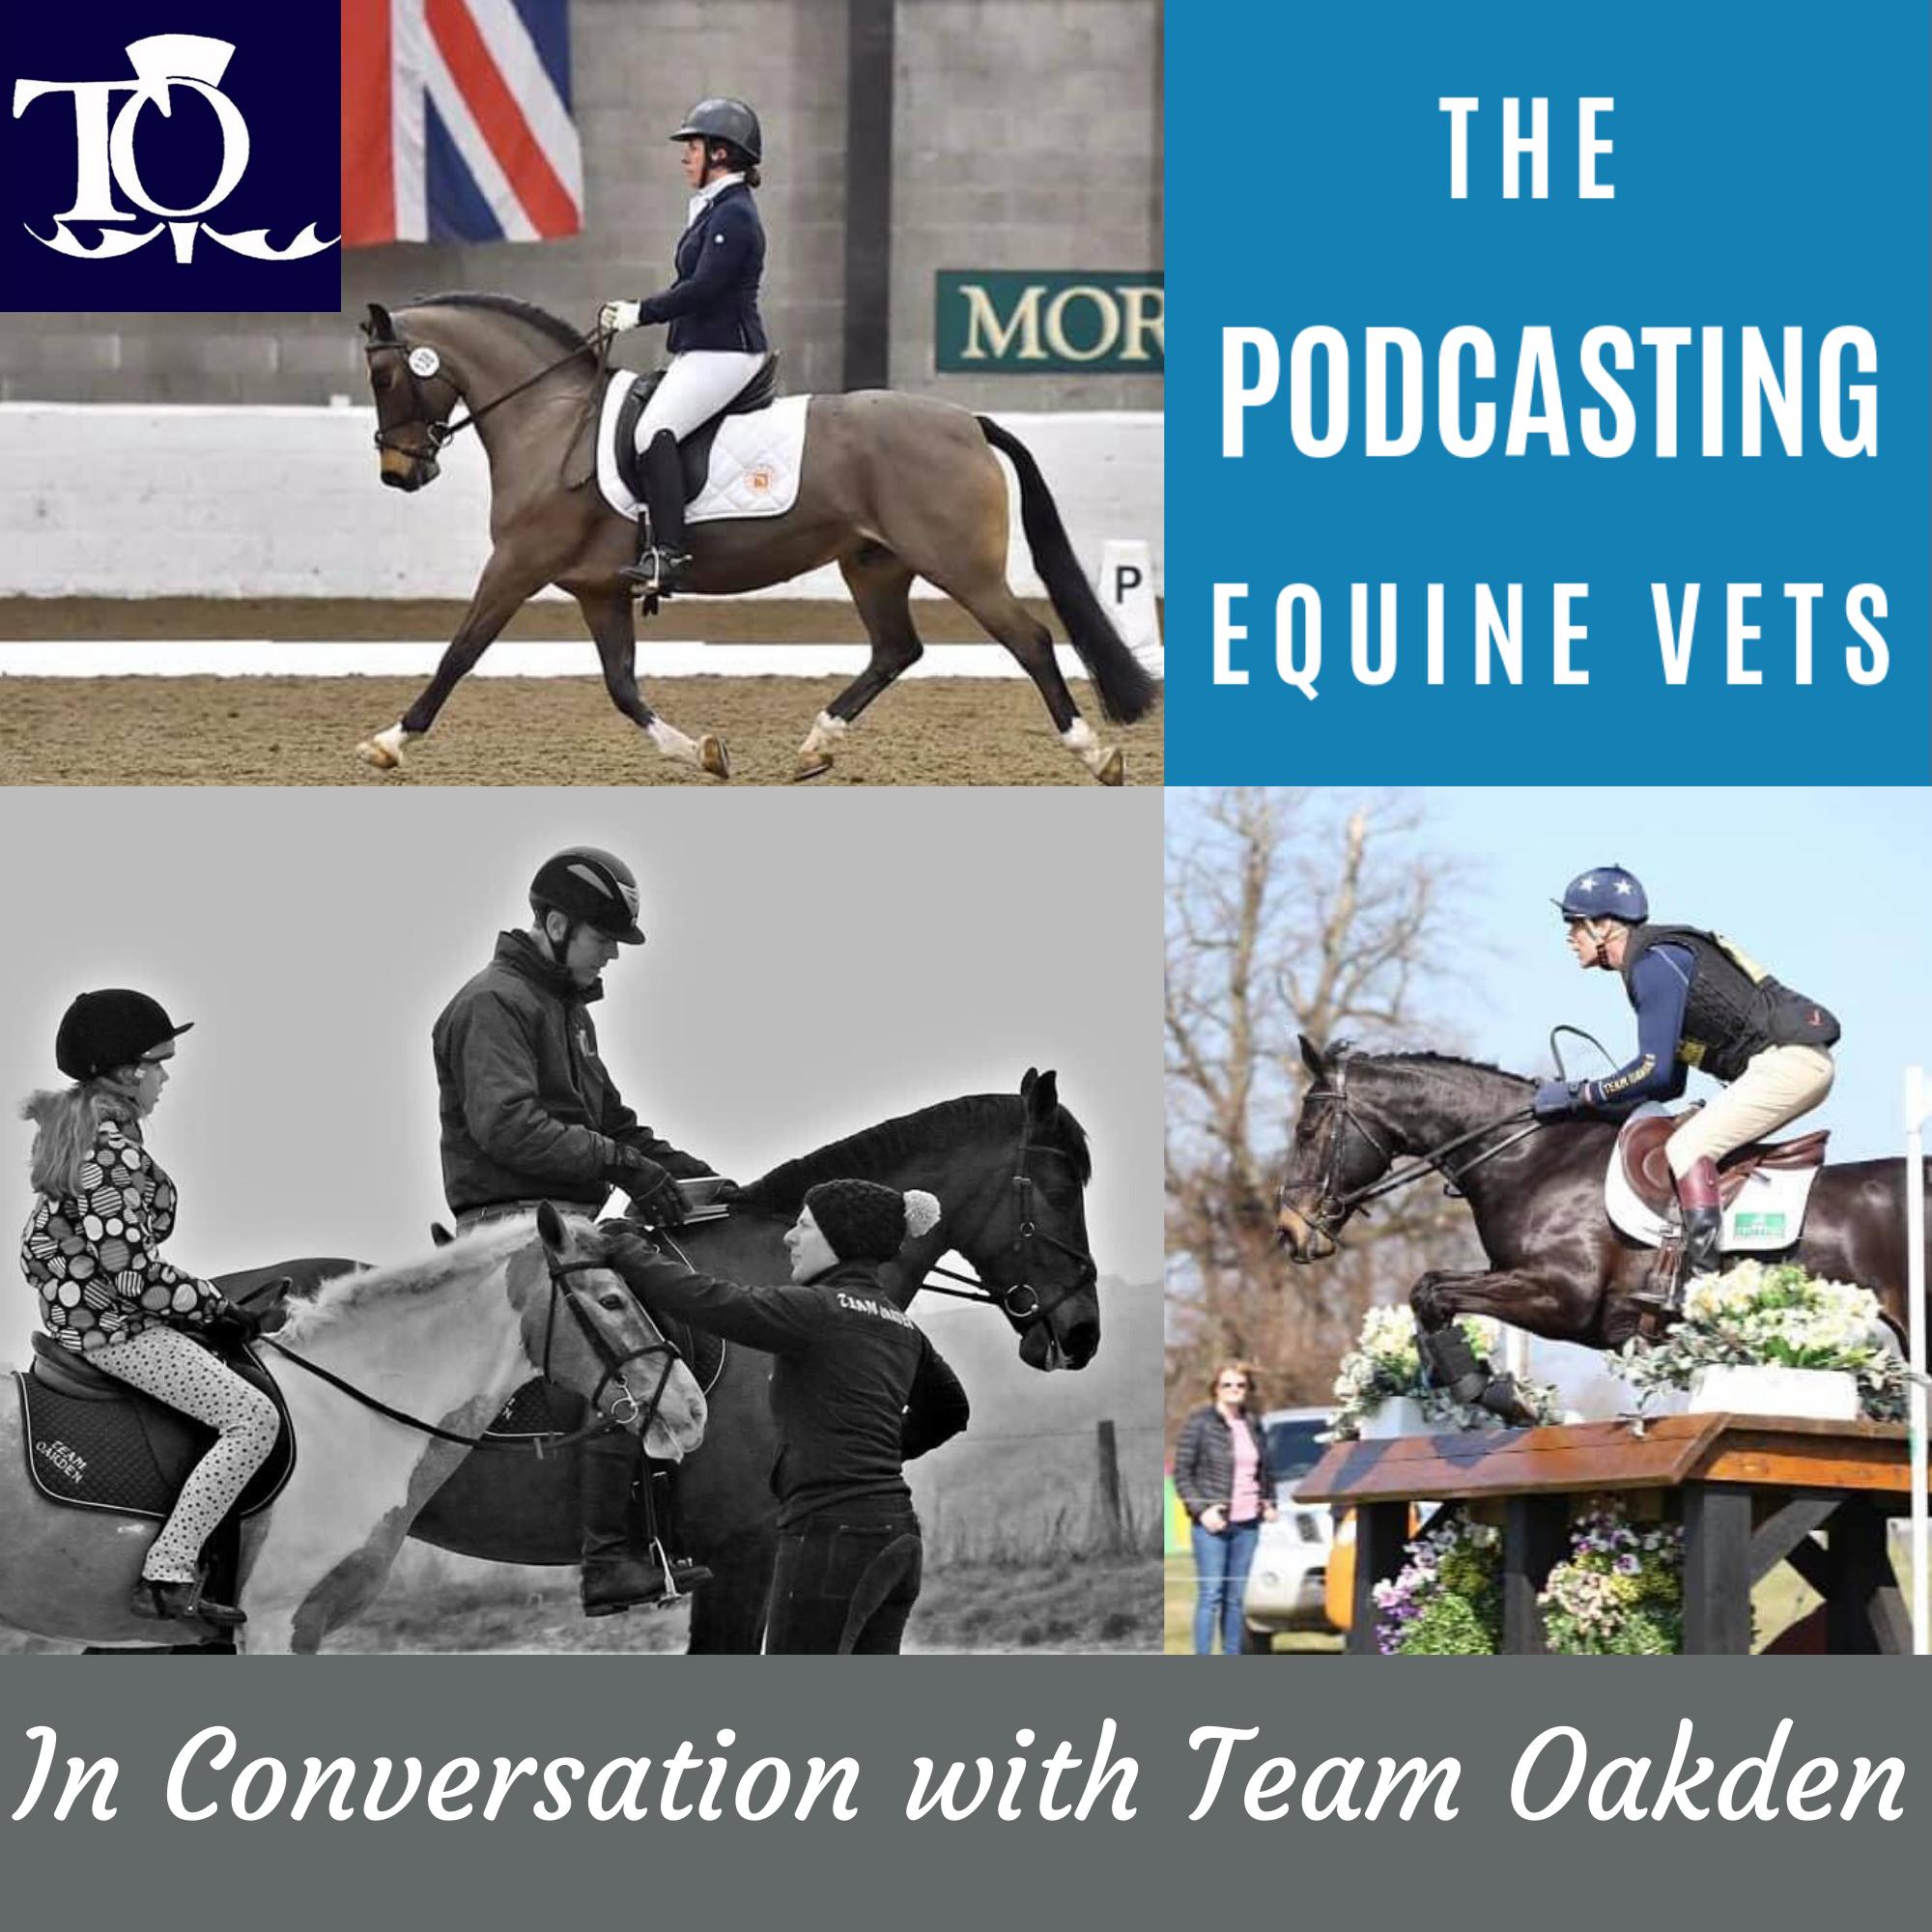 In Conversation With Team Oakden